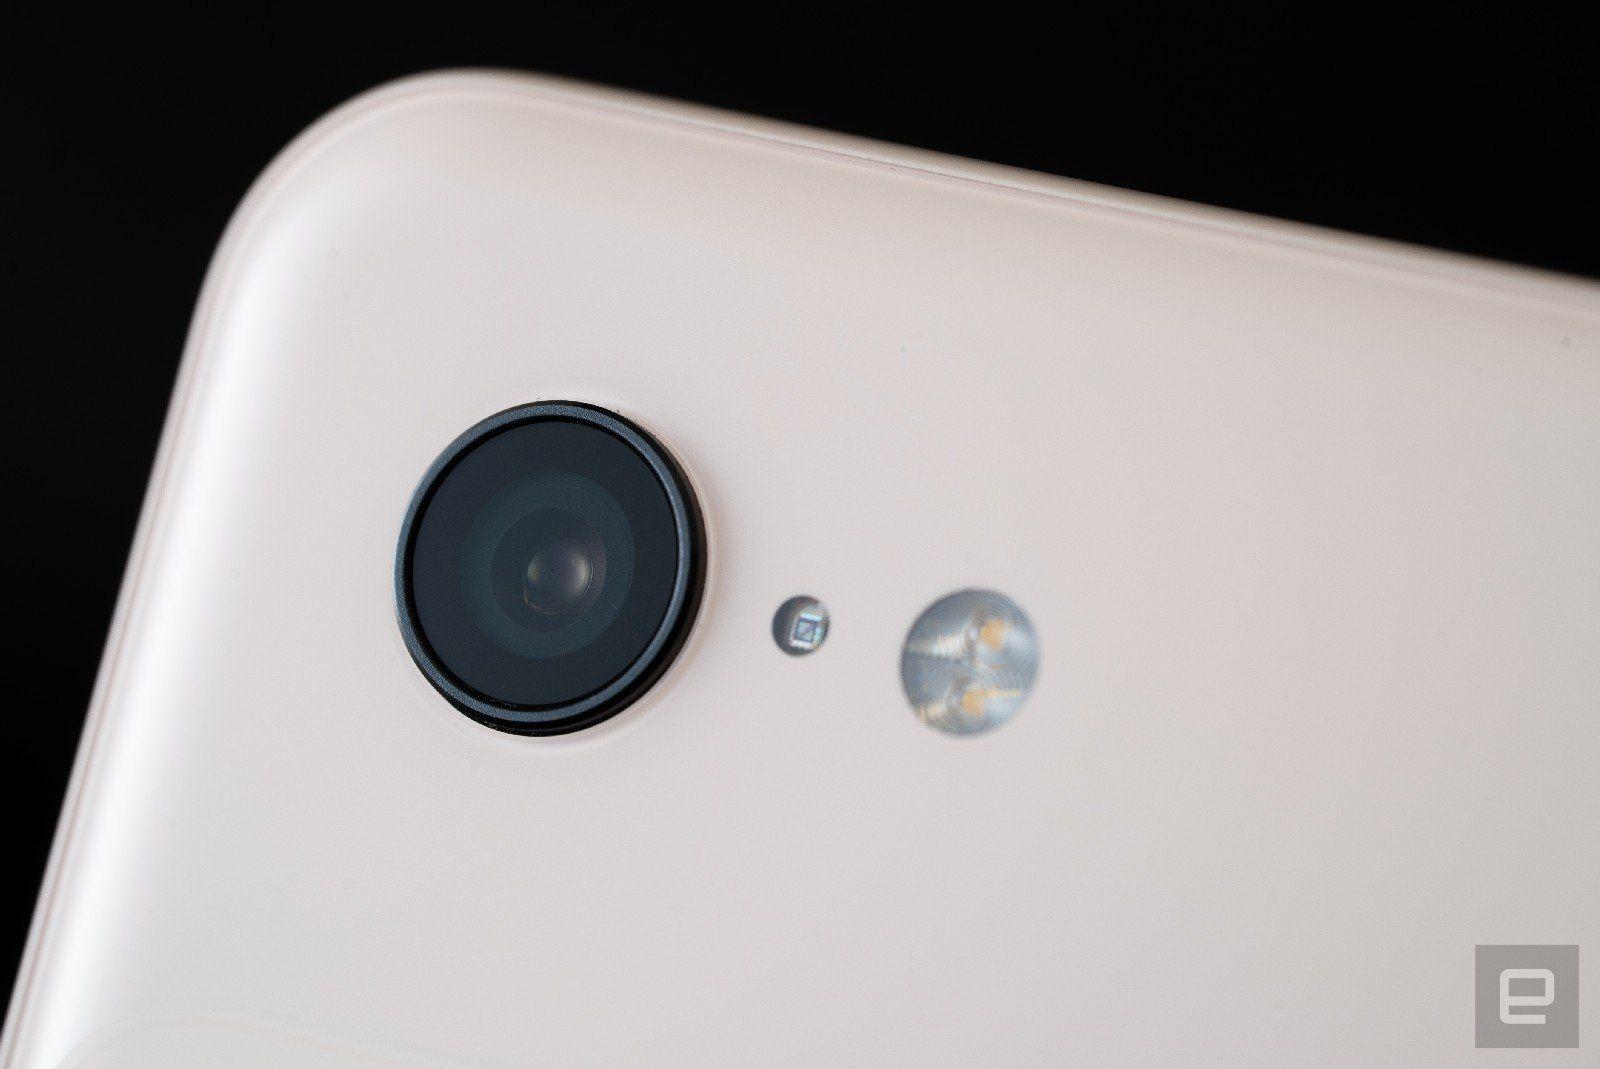 iPhone 12 Pro Max - Huawei Mate 40 Pro - Google Pixel 5: quale scegliere per le foto?